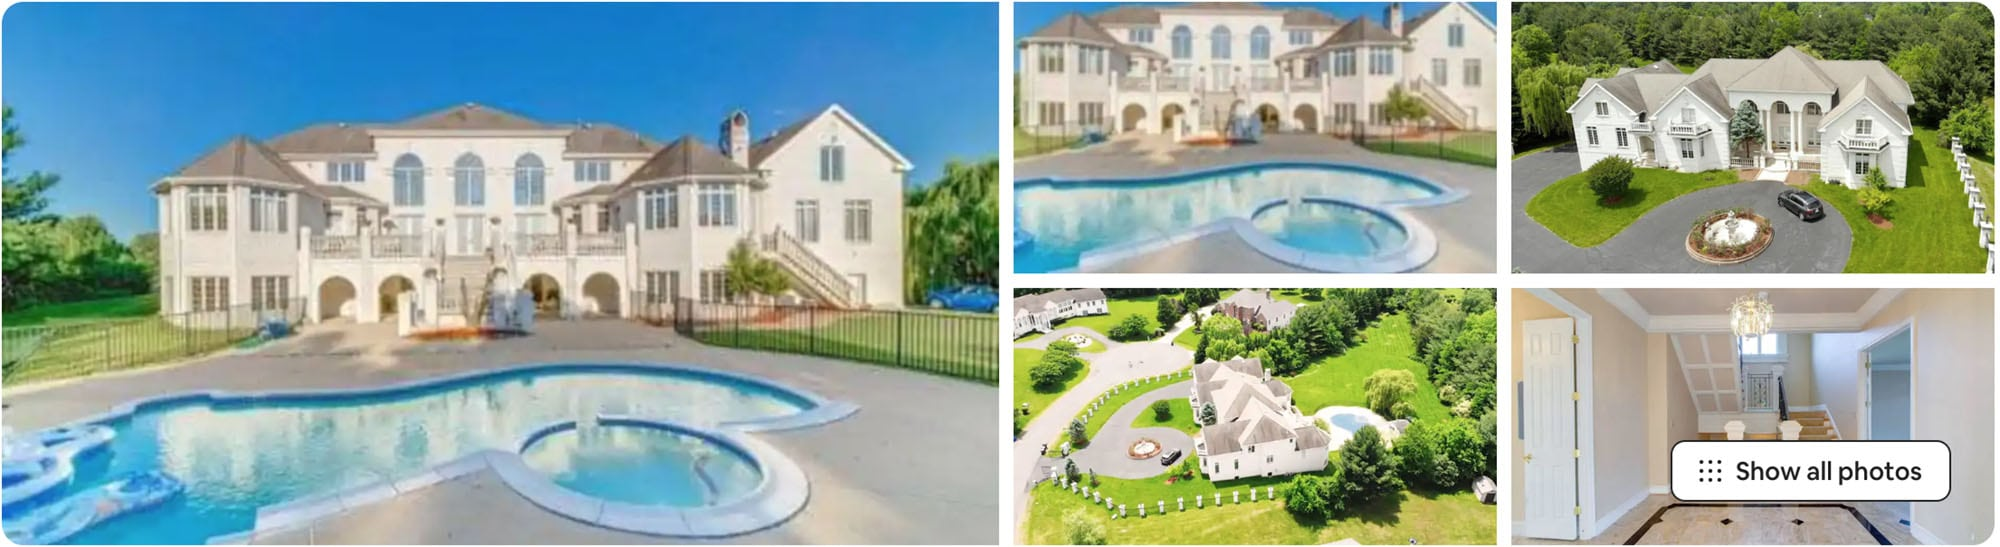 Virginia Airbnb mansion